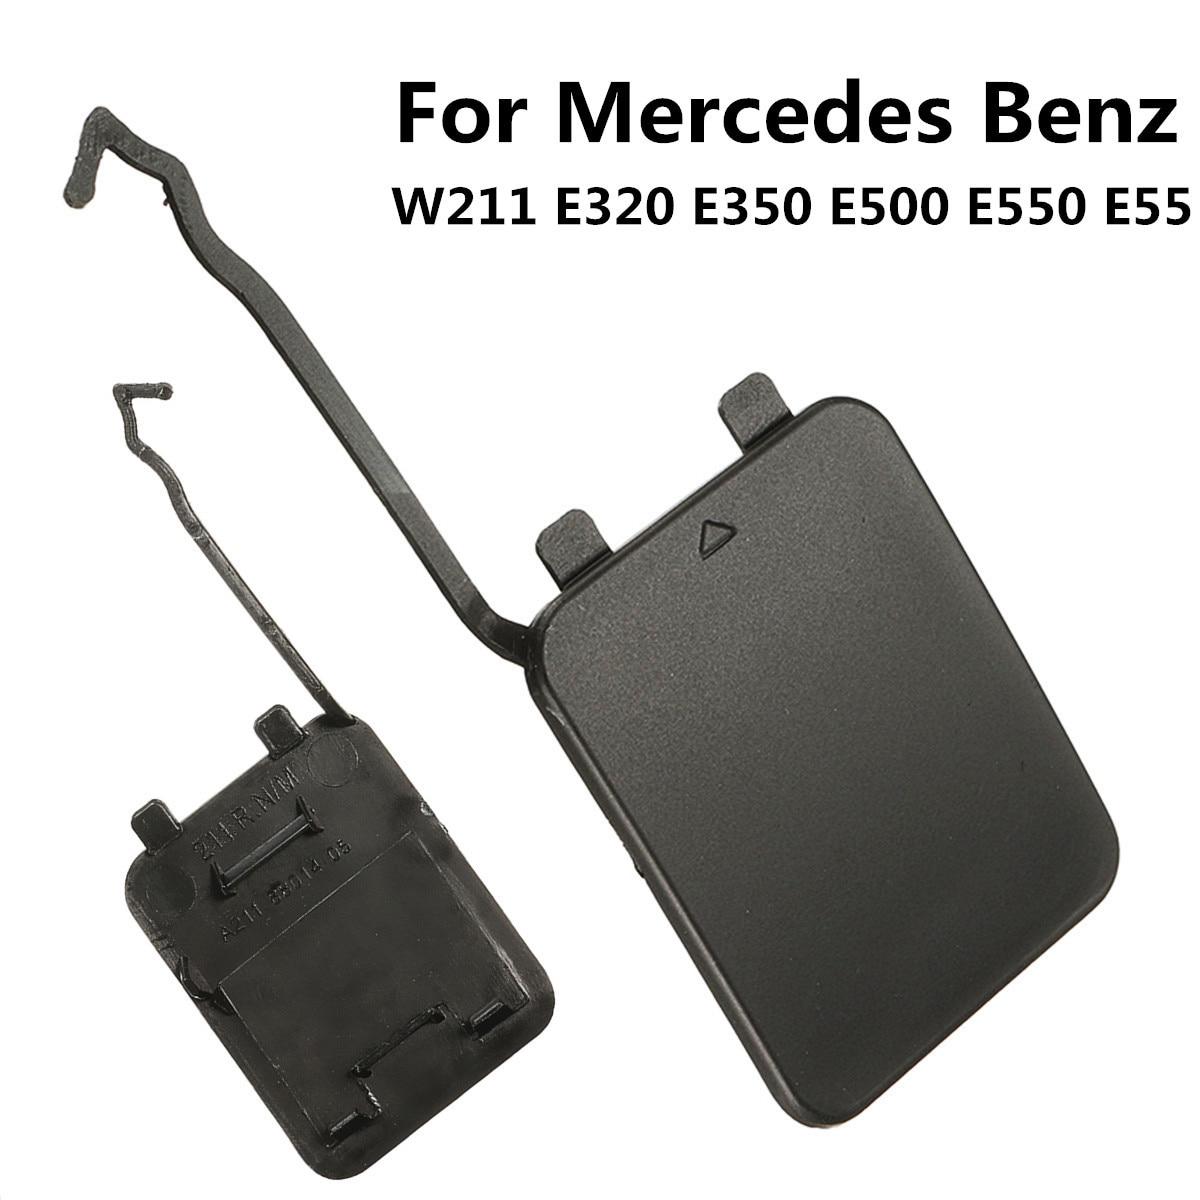 Крышка крюка заднего бампера для Mercedes-Benz W211 E55 E550 E500 E350 E320